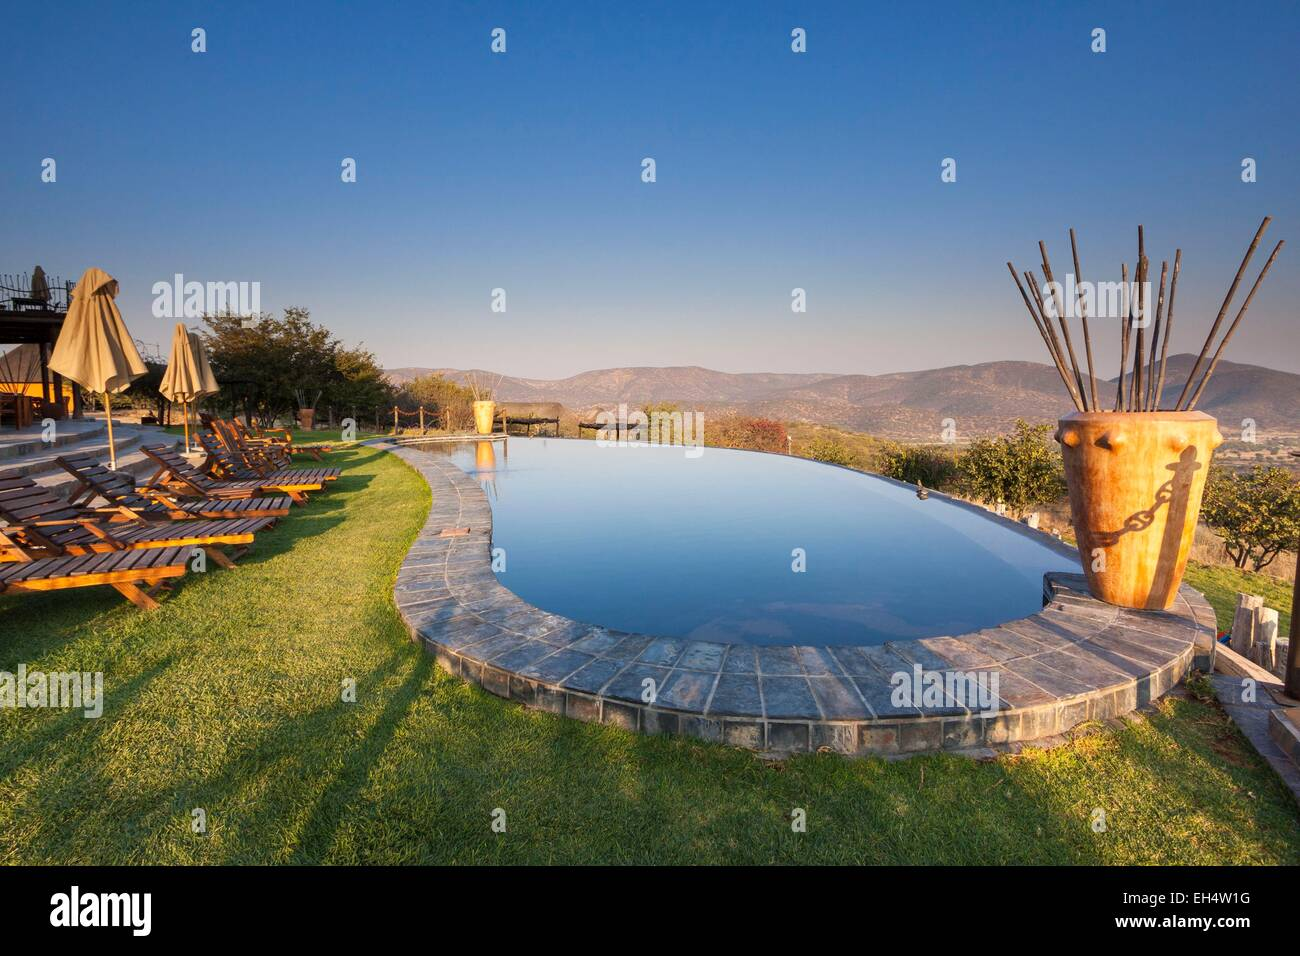 Namibia, Kunene region, Kaokoland, Opuwo, pool Opuwo country lodge - Stock Image